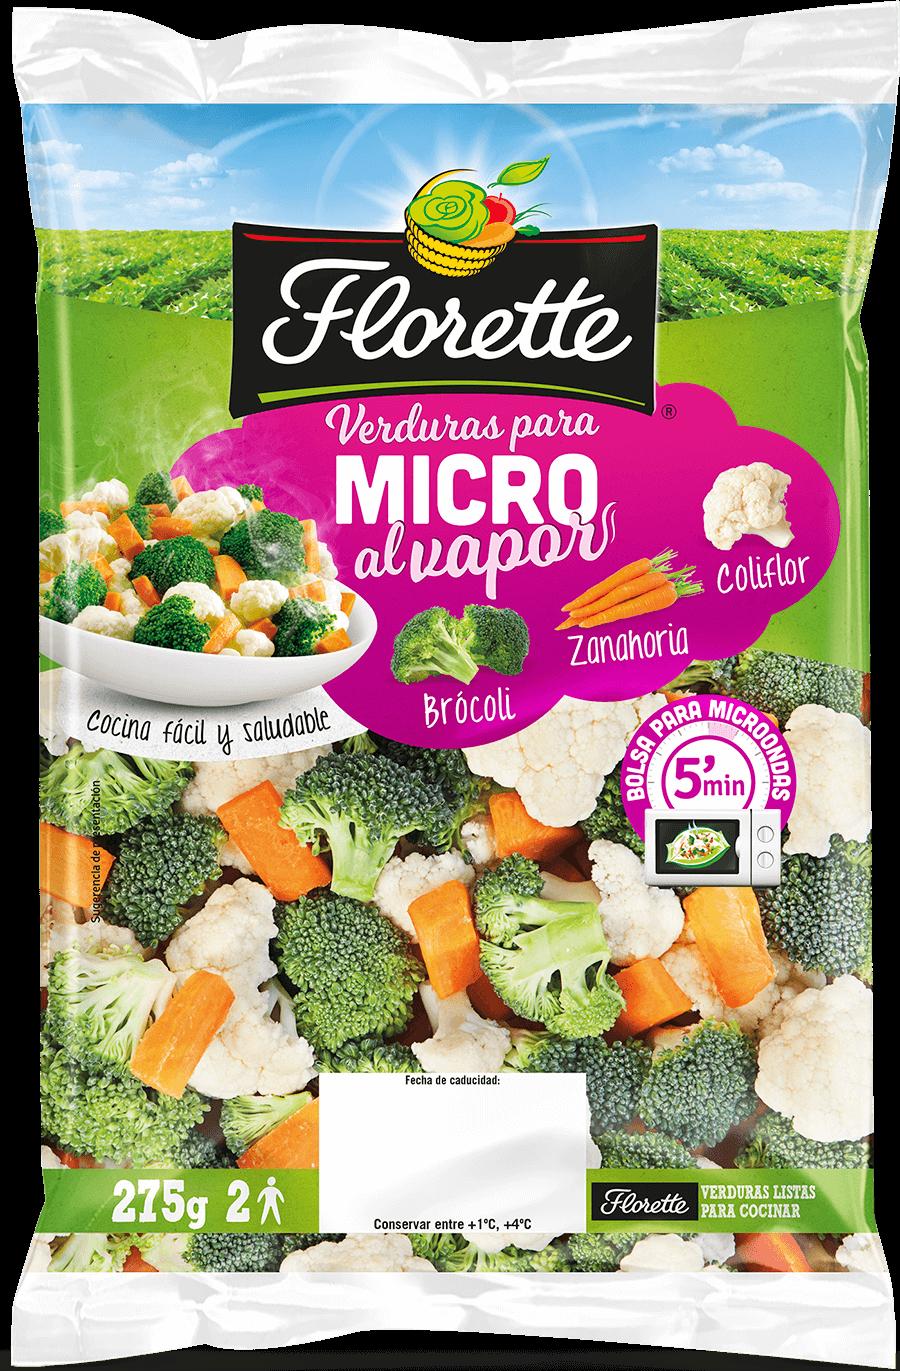 Bolsa de ensalada para microondas con zanahoria, brócoli y coliflor